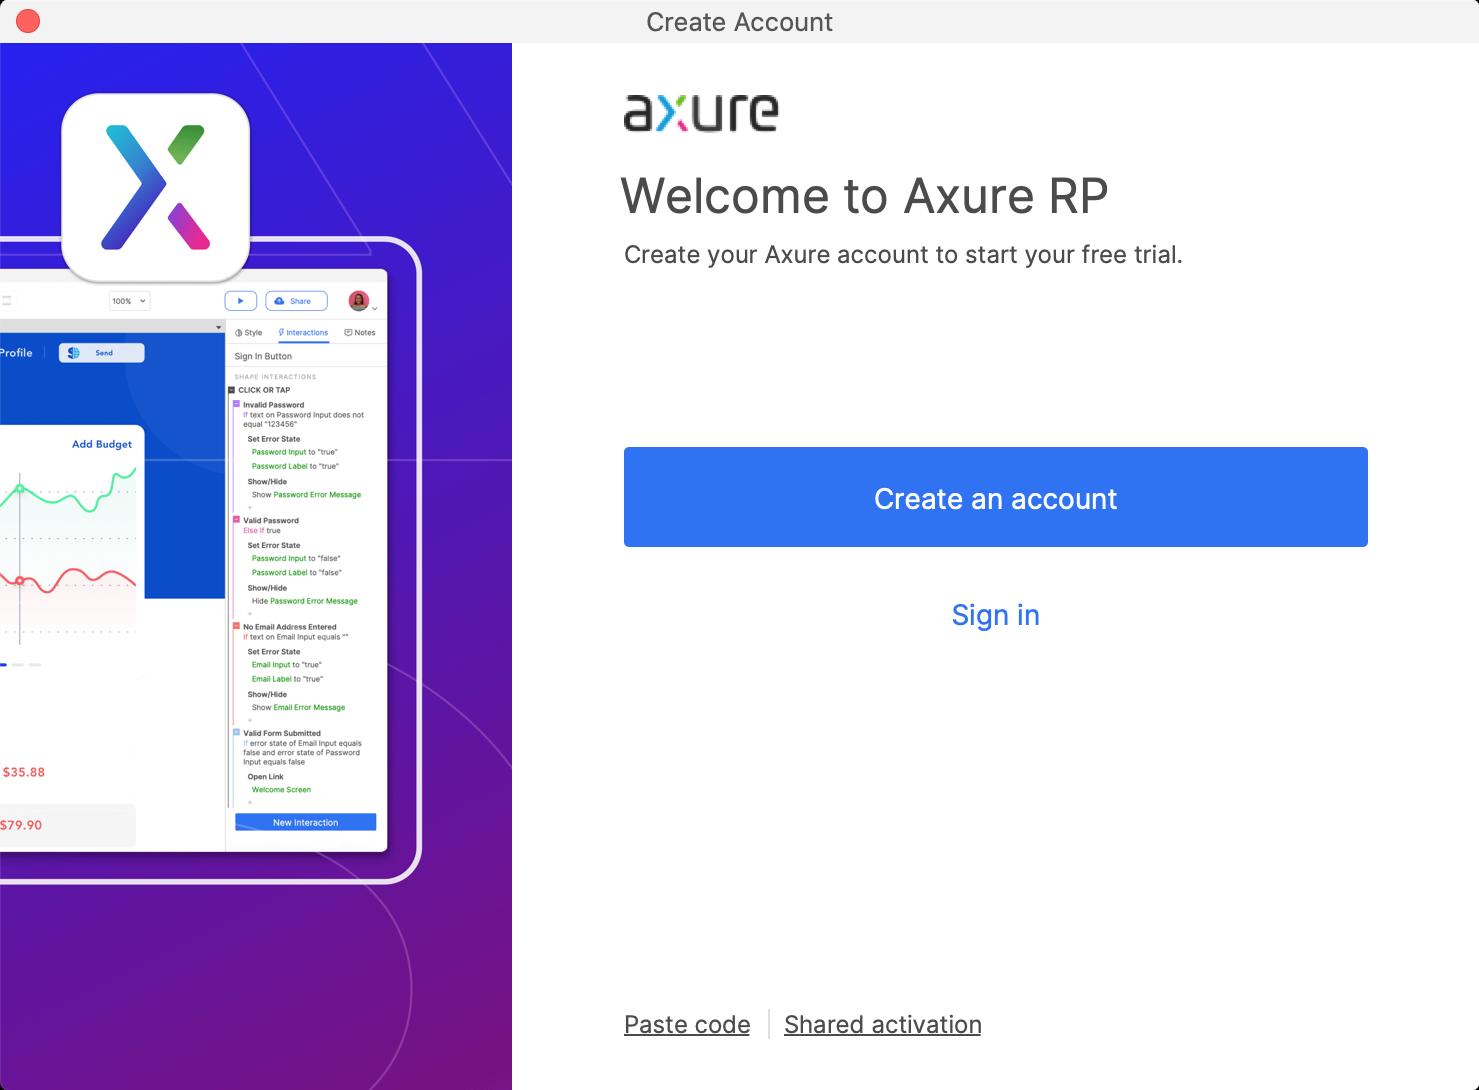 Axure RP创建帐户对话框